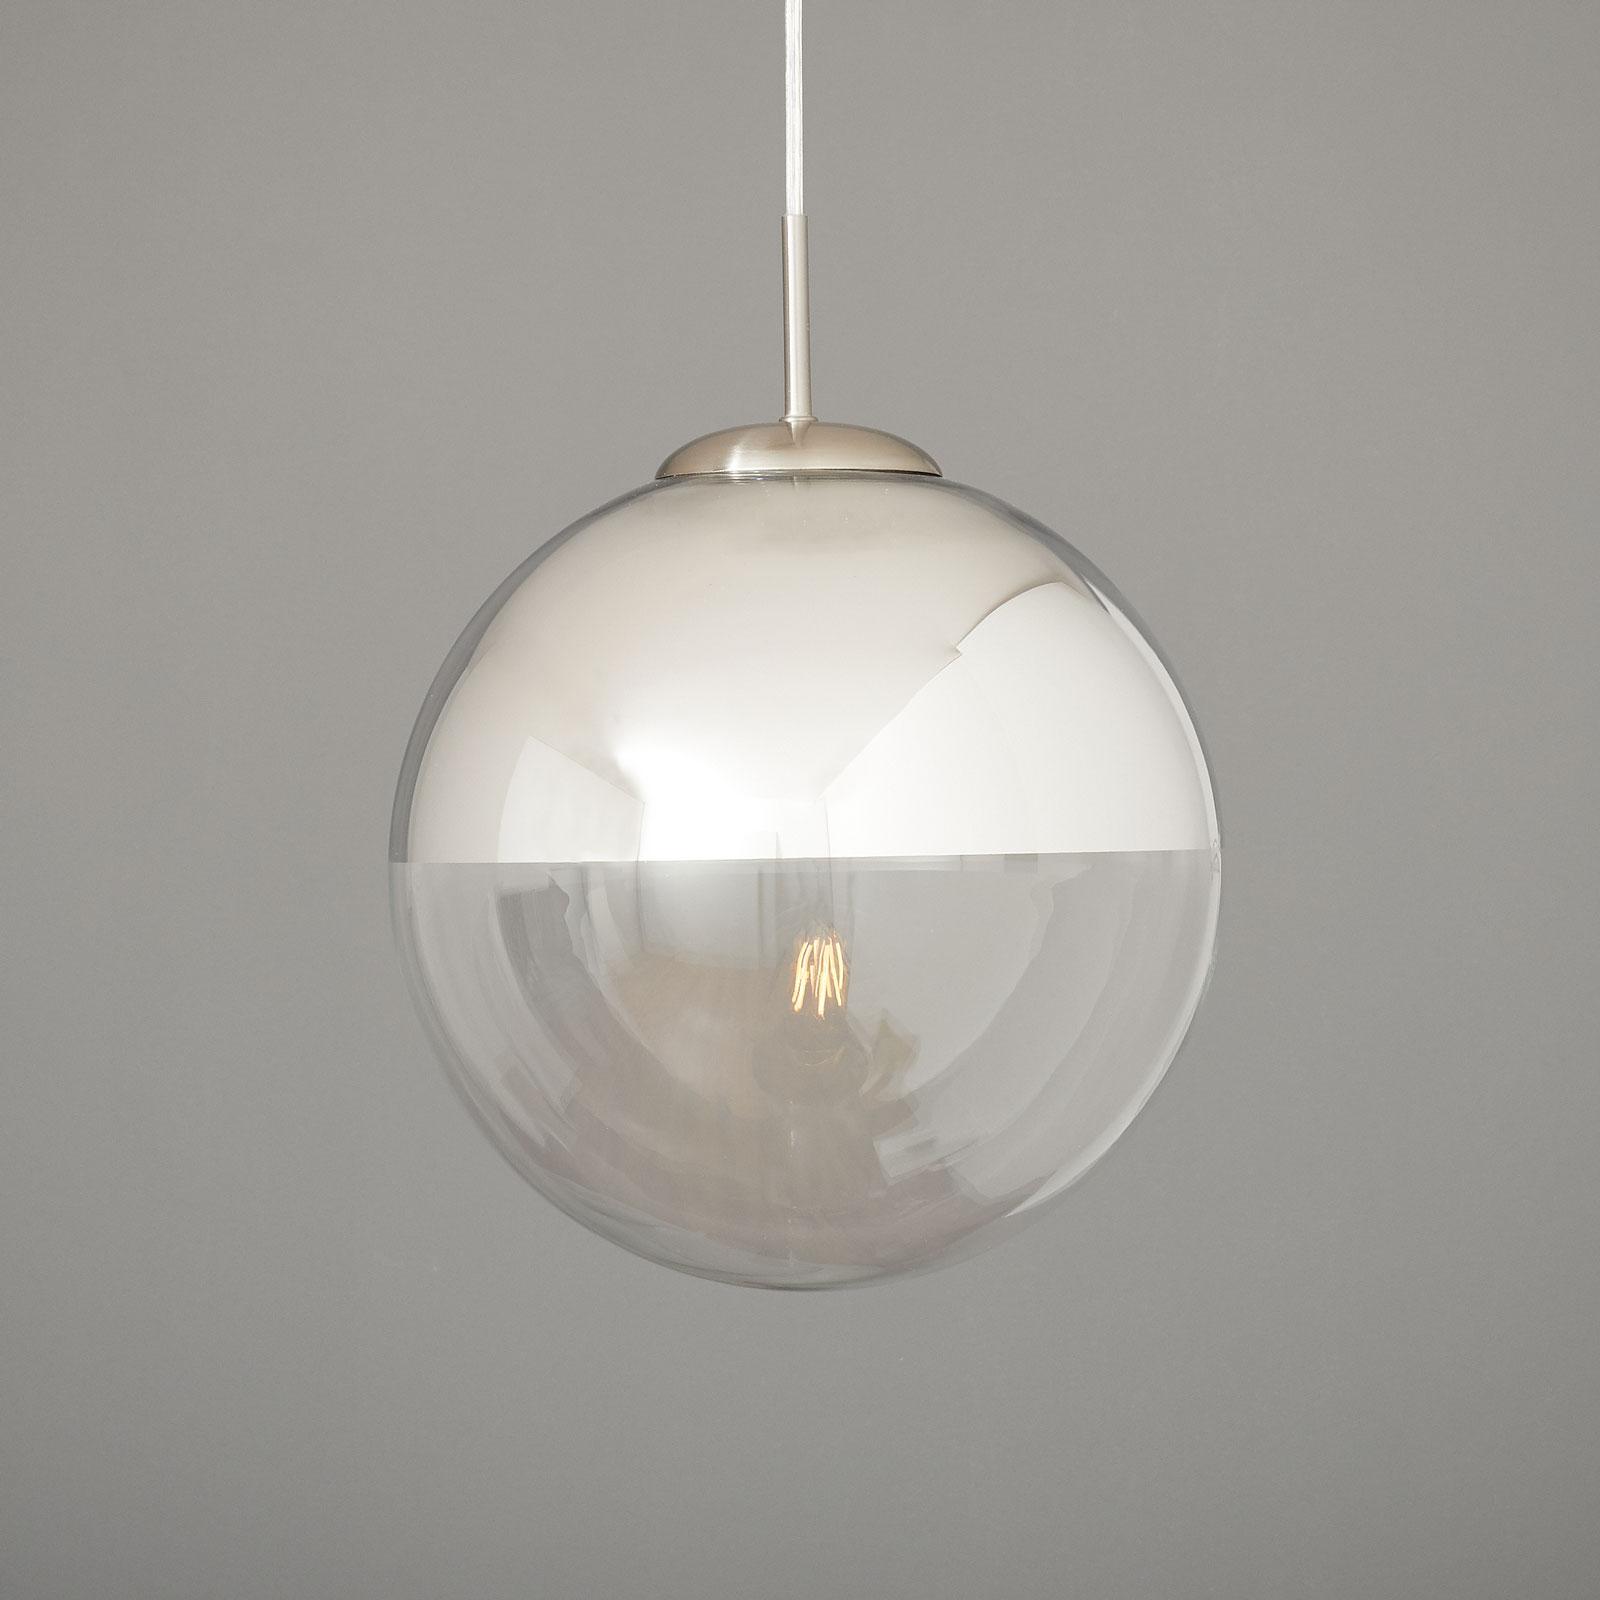 Lampa wisząca Ravena, kula szklana, 1-punktowa